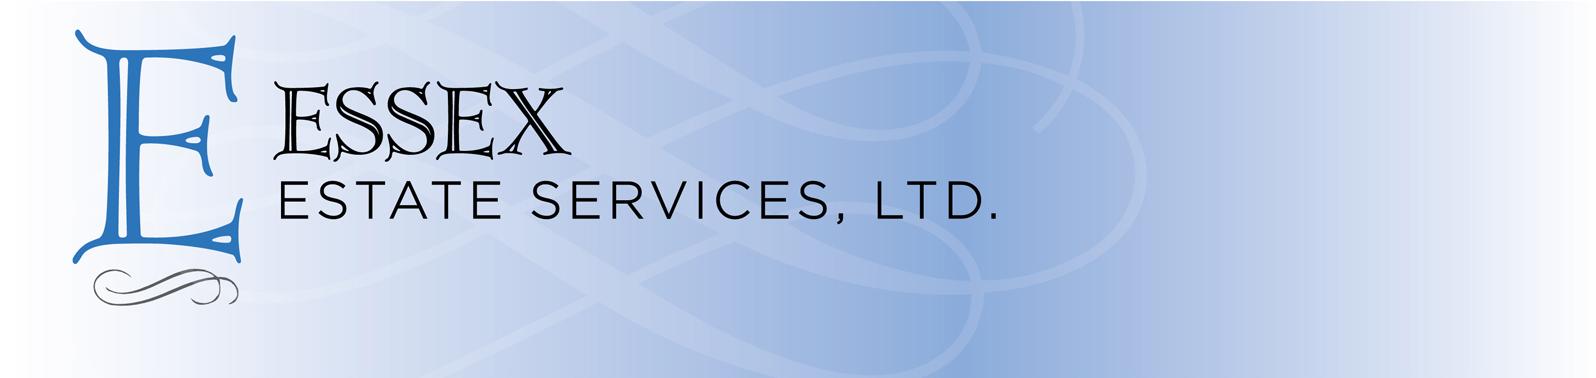 Essex Estate Services, Ltd.